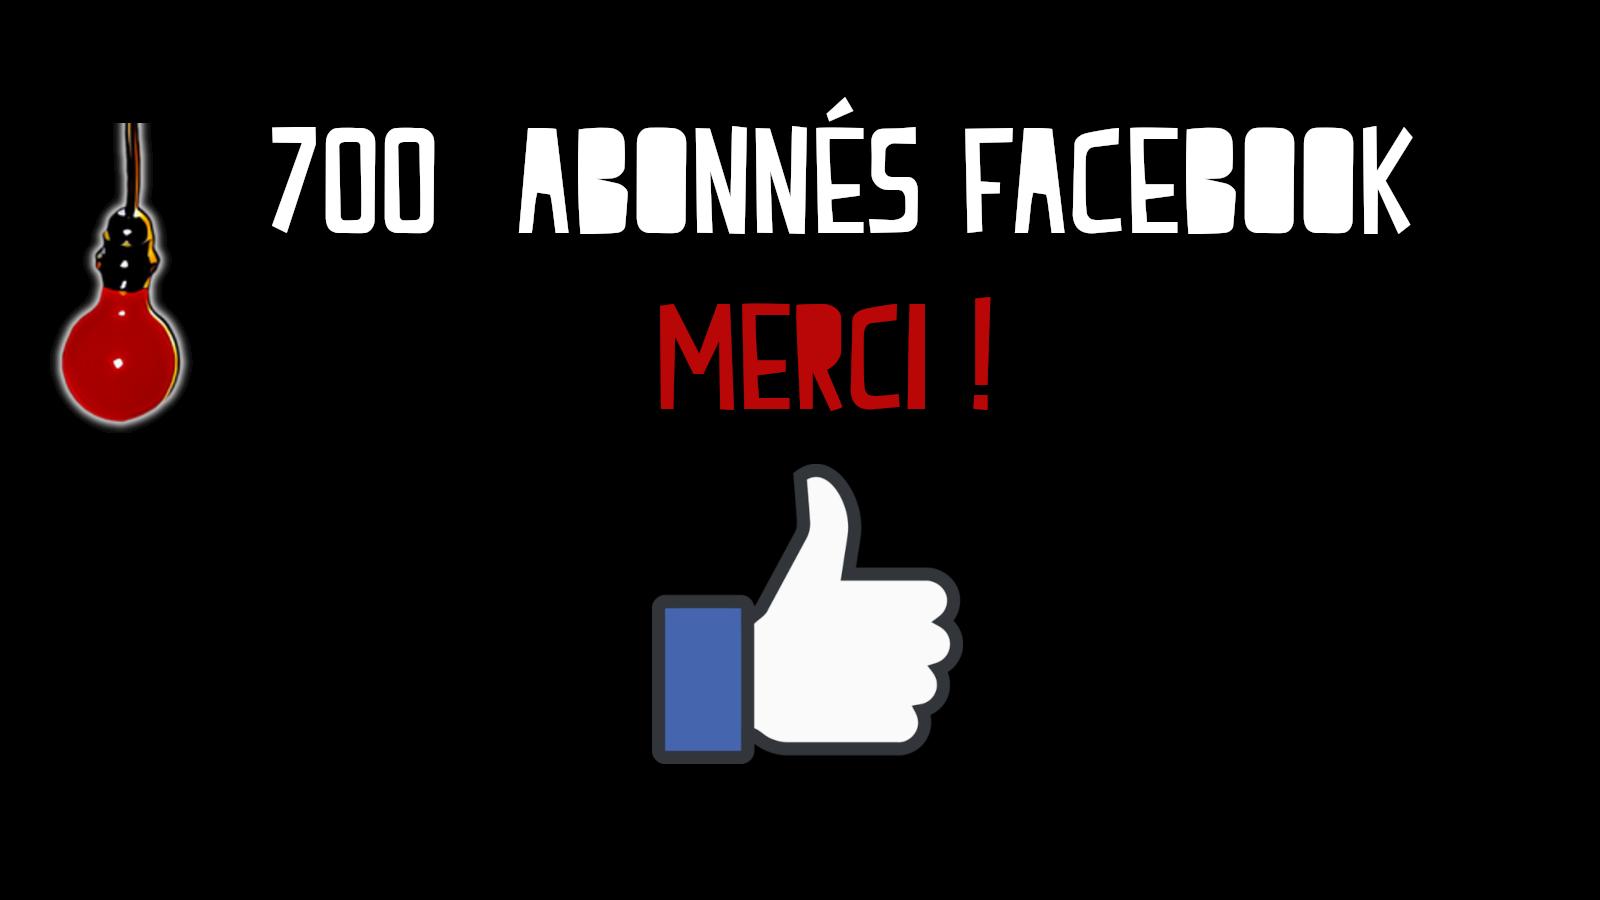 LEON NEIMAD : 700 abonnés facebook